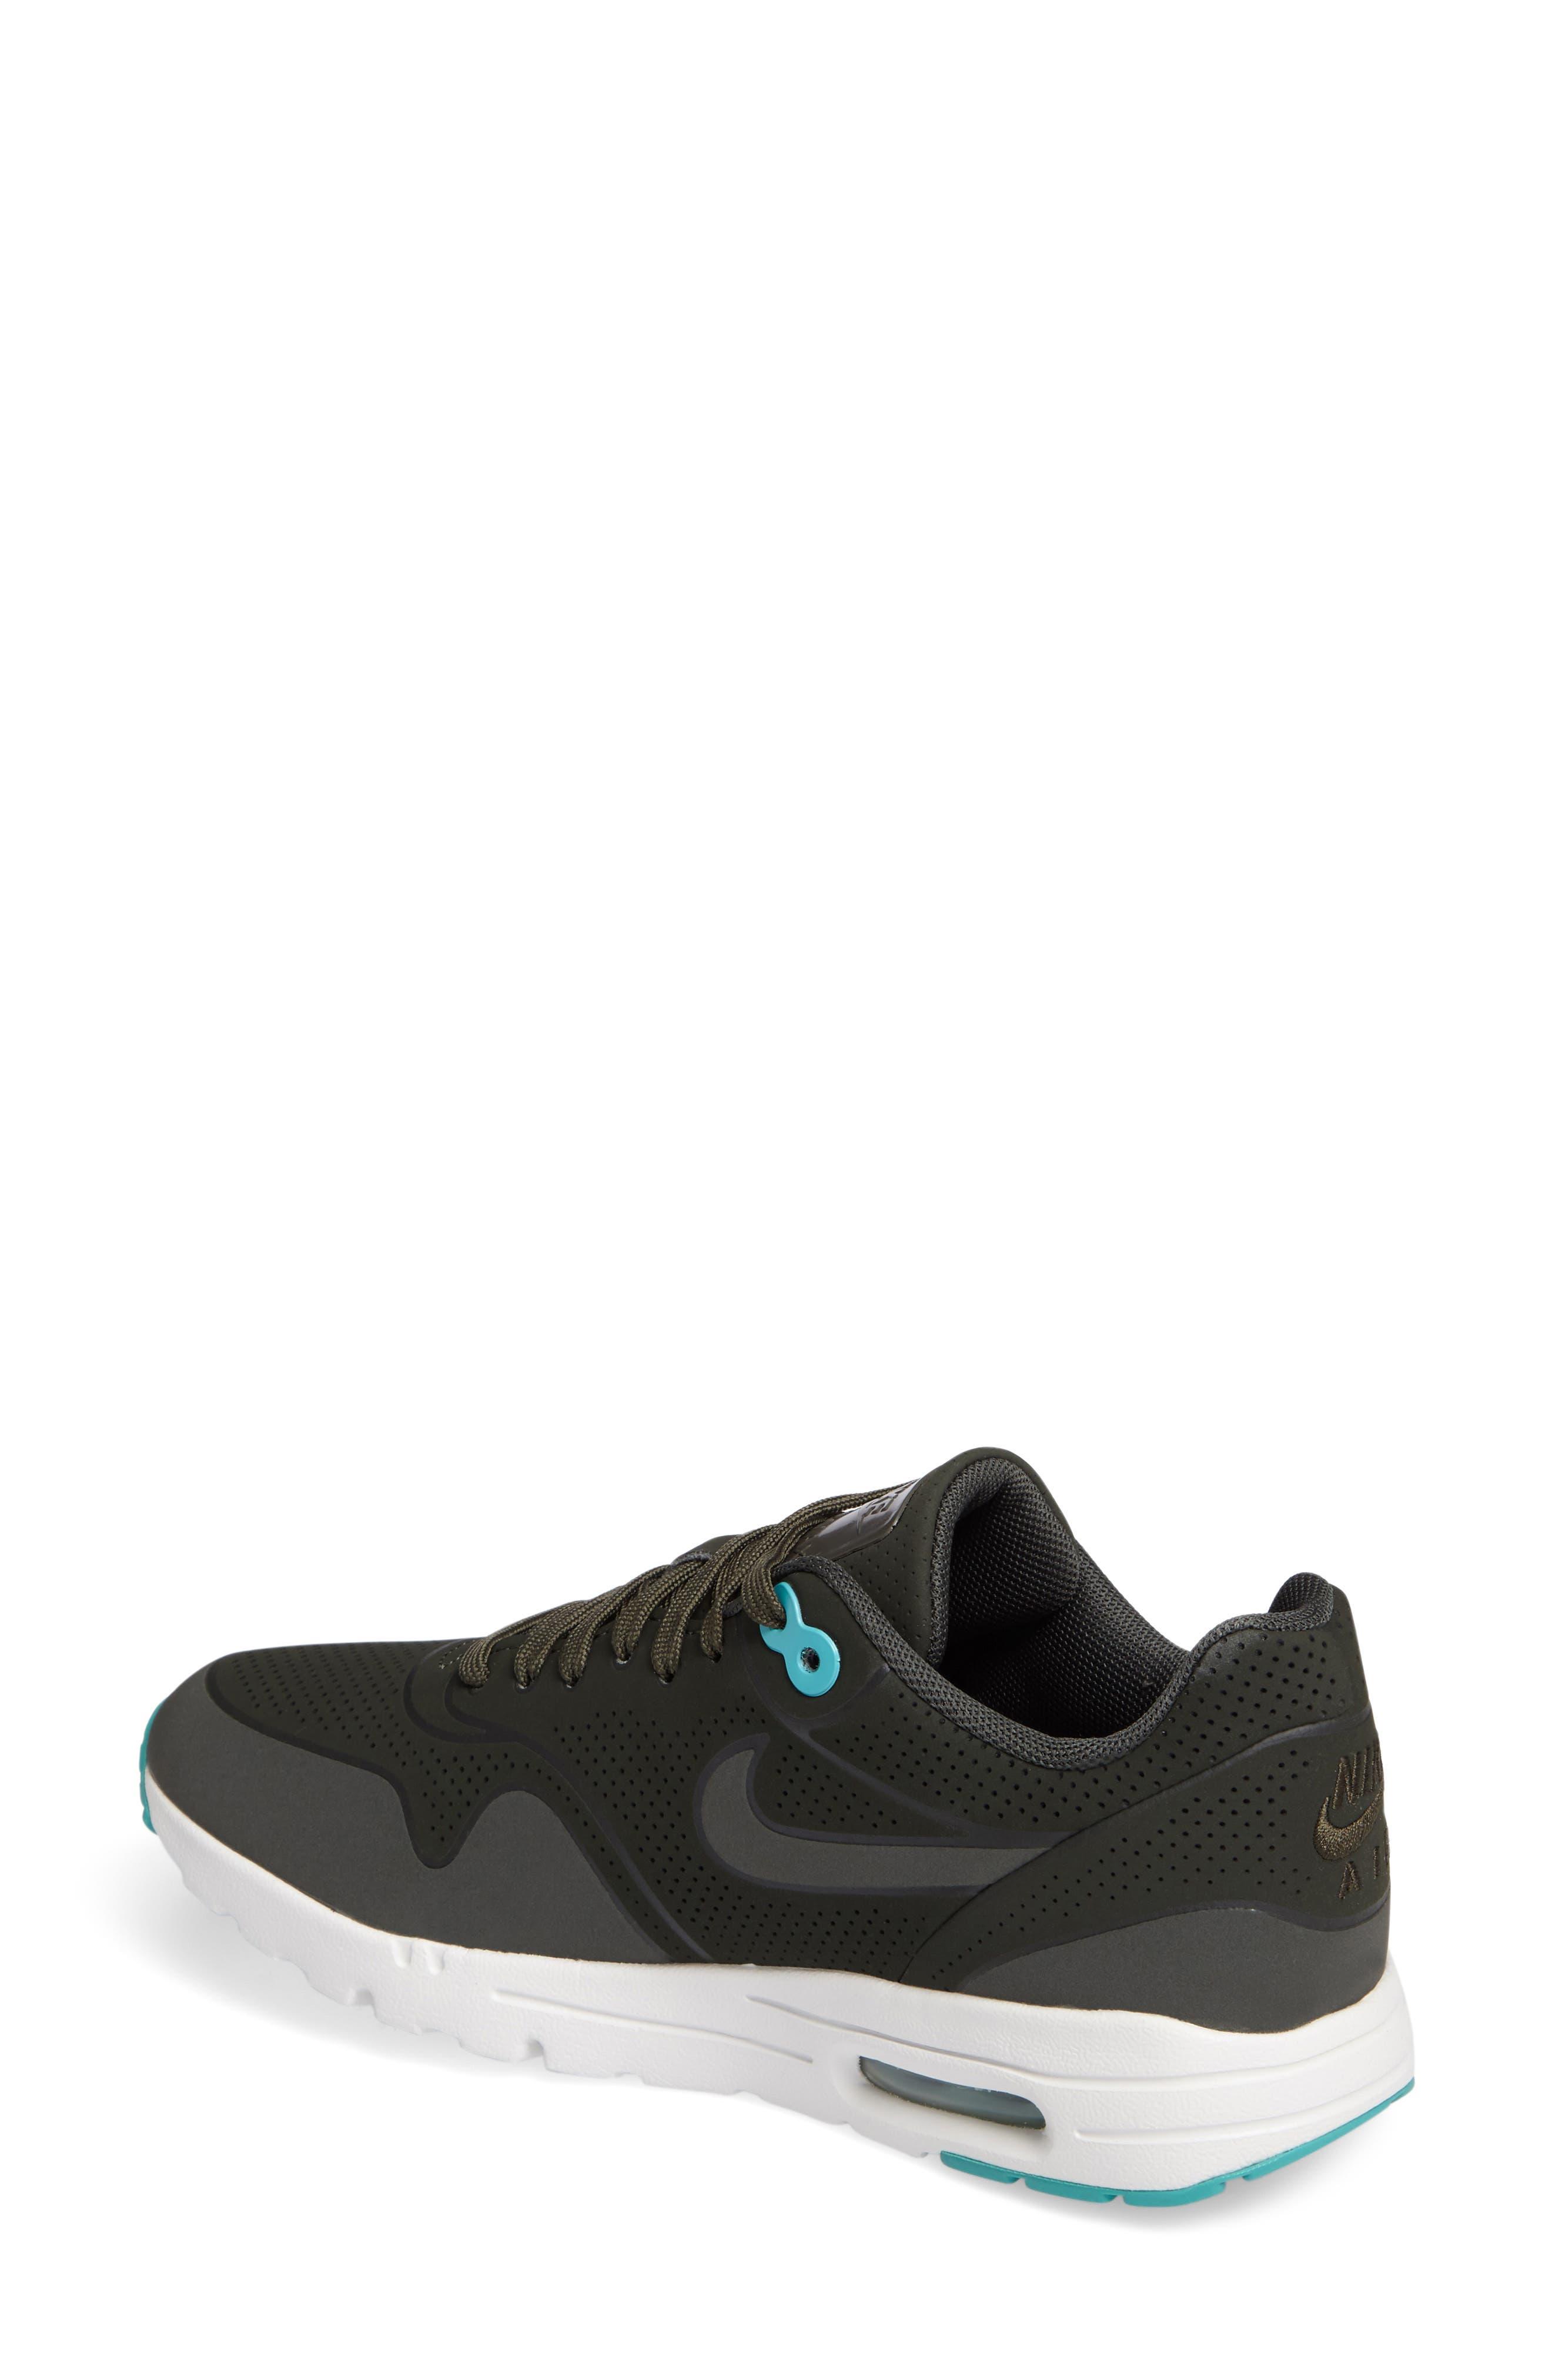 ,                             'Air Max 1 - Ultra Moire' Sneaker,                             Alternate thumbnail 59, color,                             304